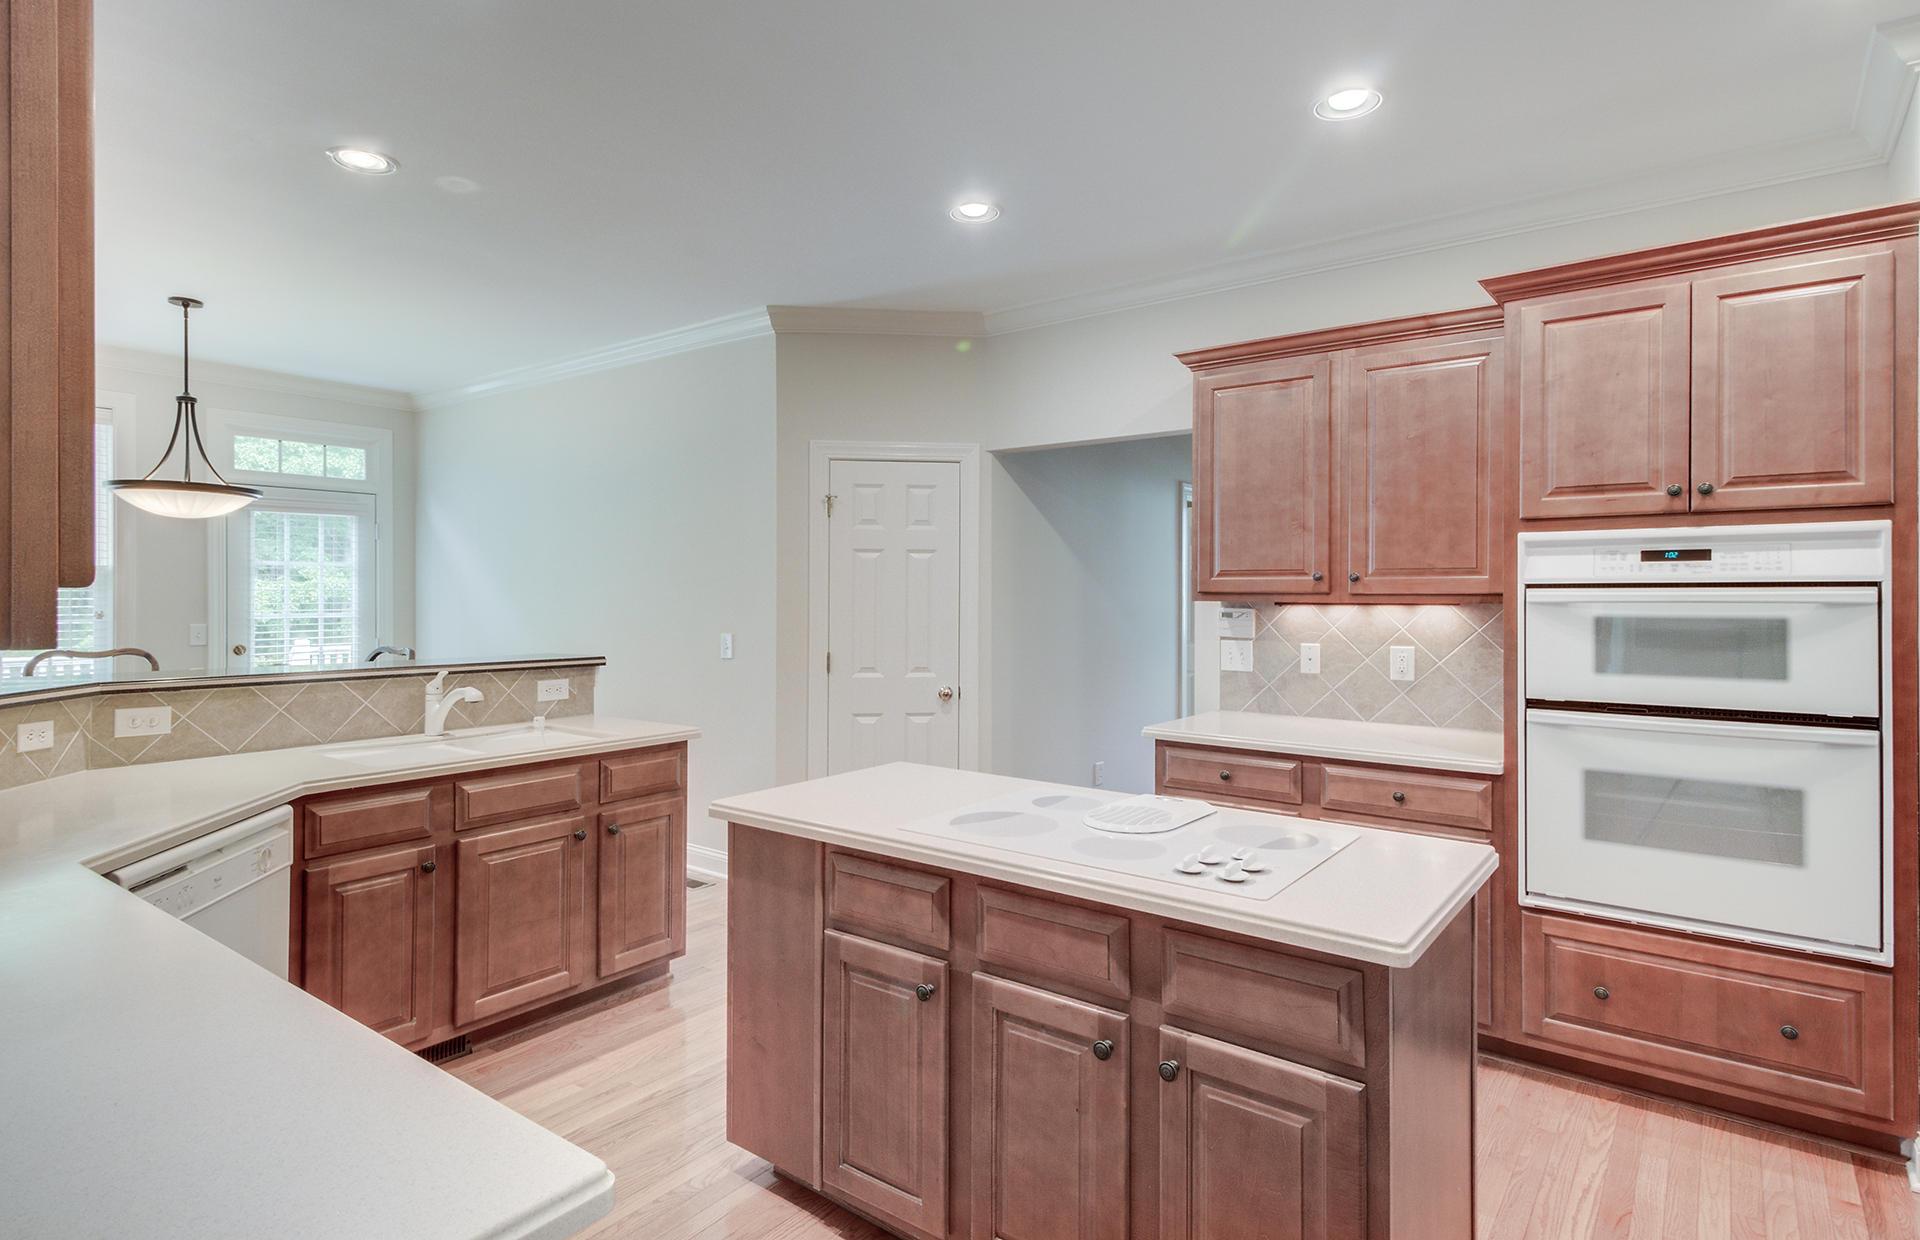 Dunes West Homes For Sale - 2453 Darts Cove, Mount Pleasant, SC - 32